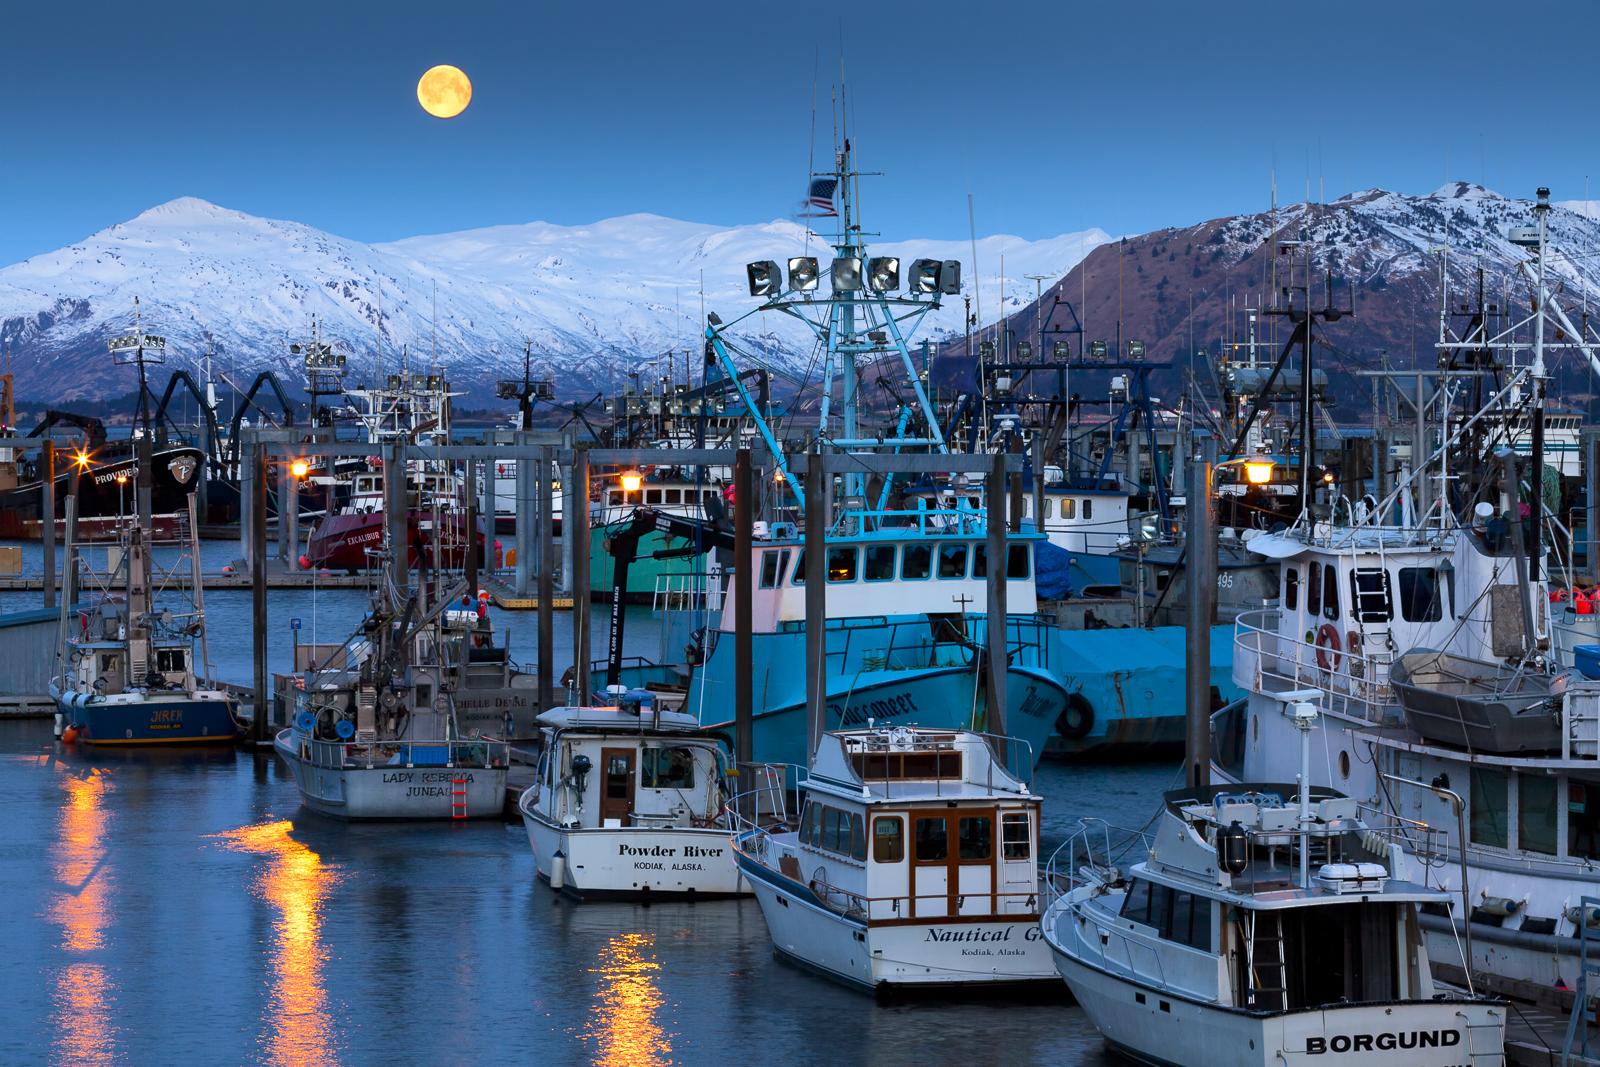 Kodiak, Alaska, moon, full moon, moonrise